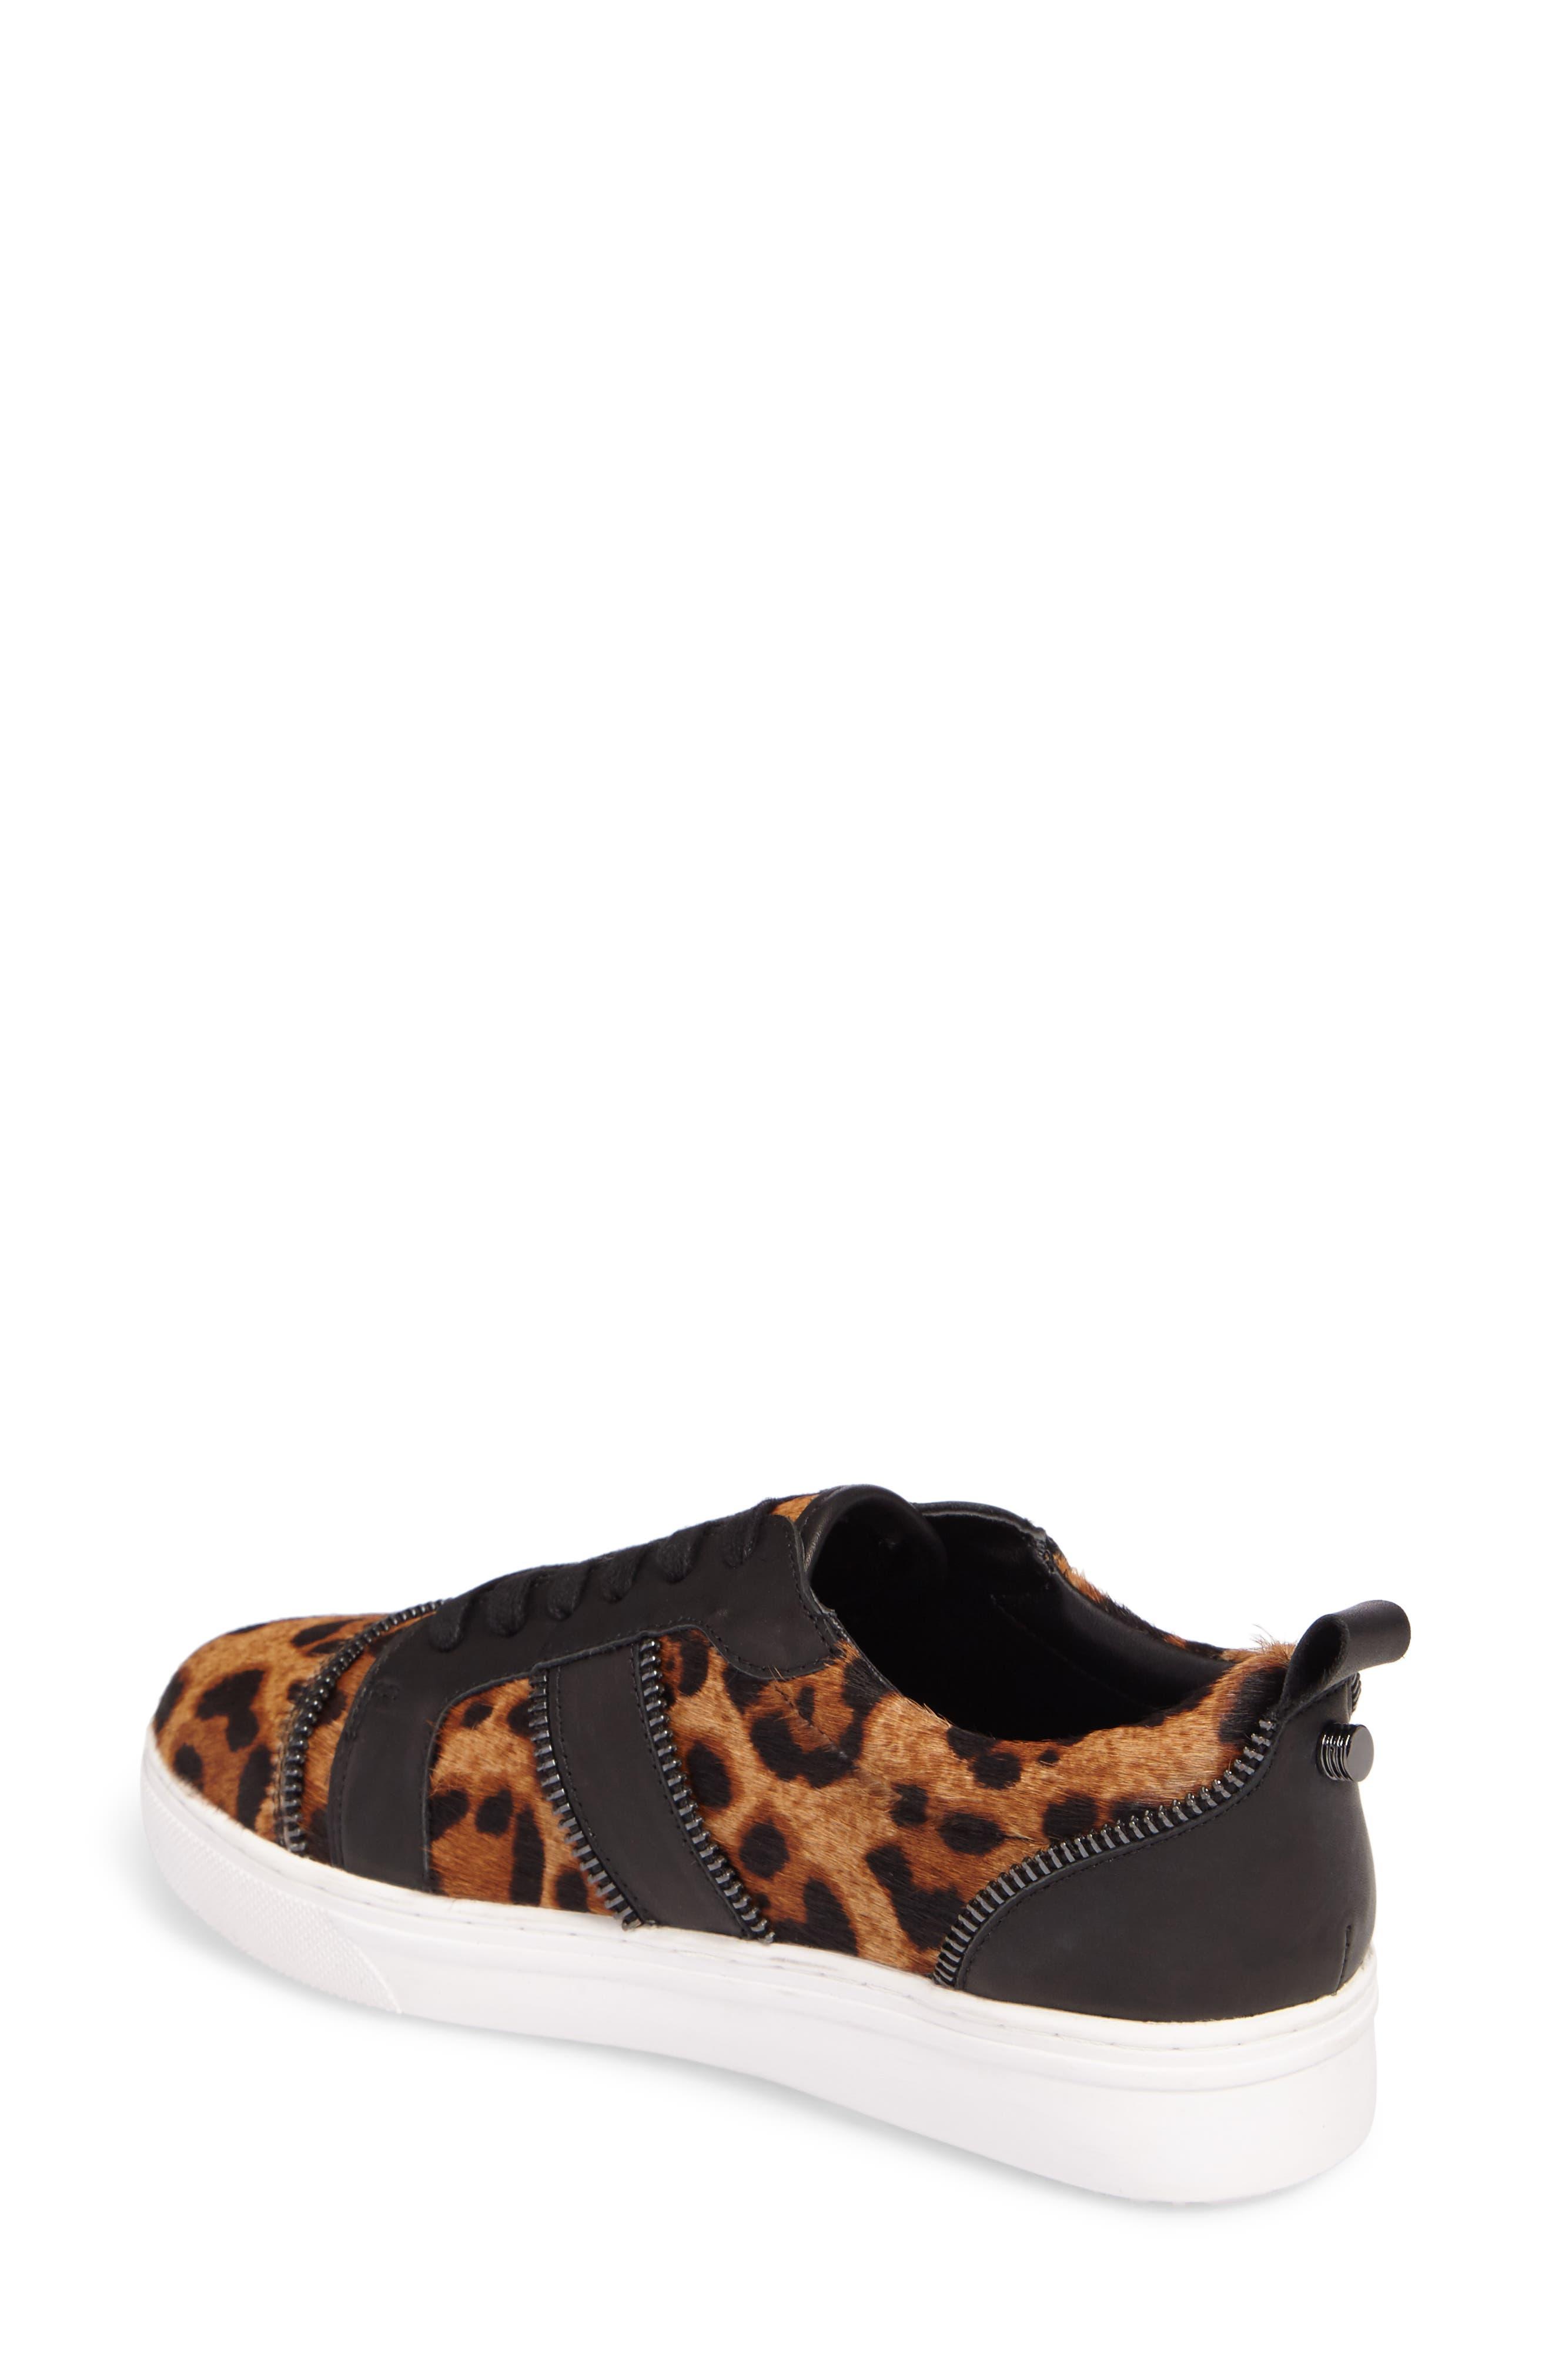 Harvey Genuine Calf Hair Sneaker,                             Alternate thumbnail 2, color,                             Leopard Calf Hair